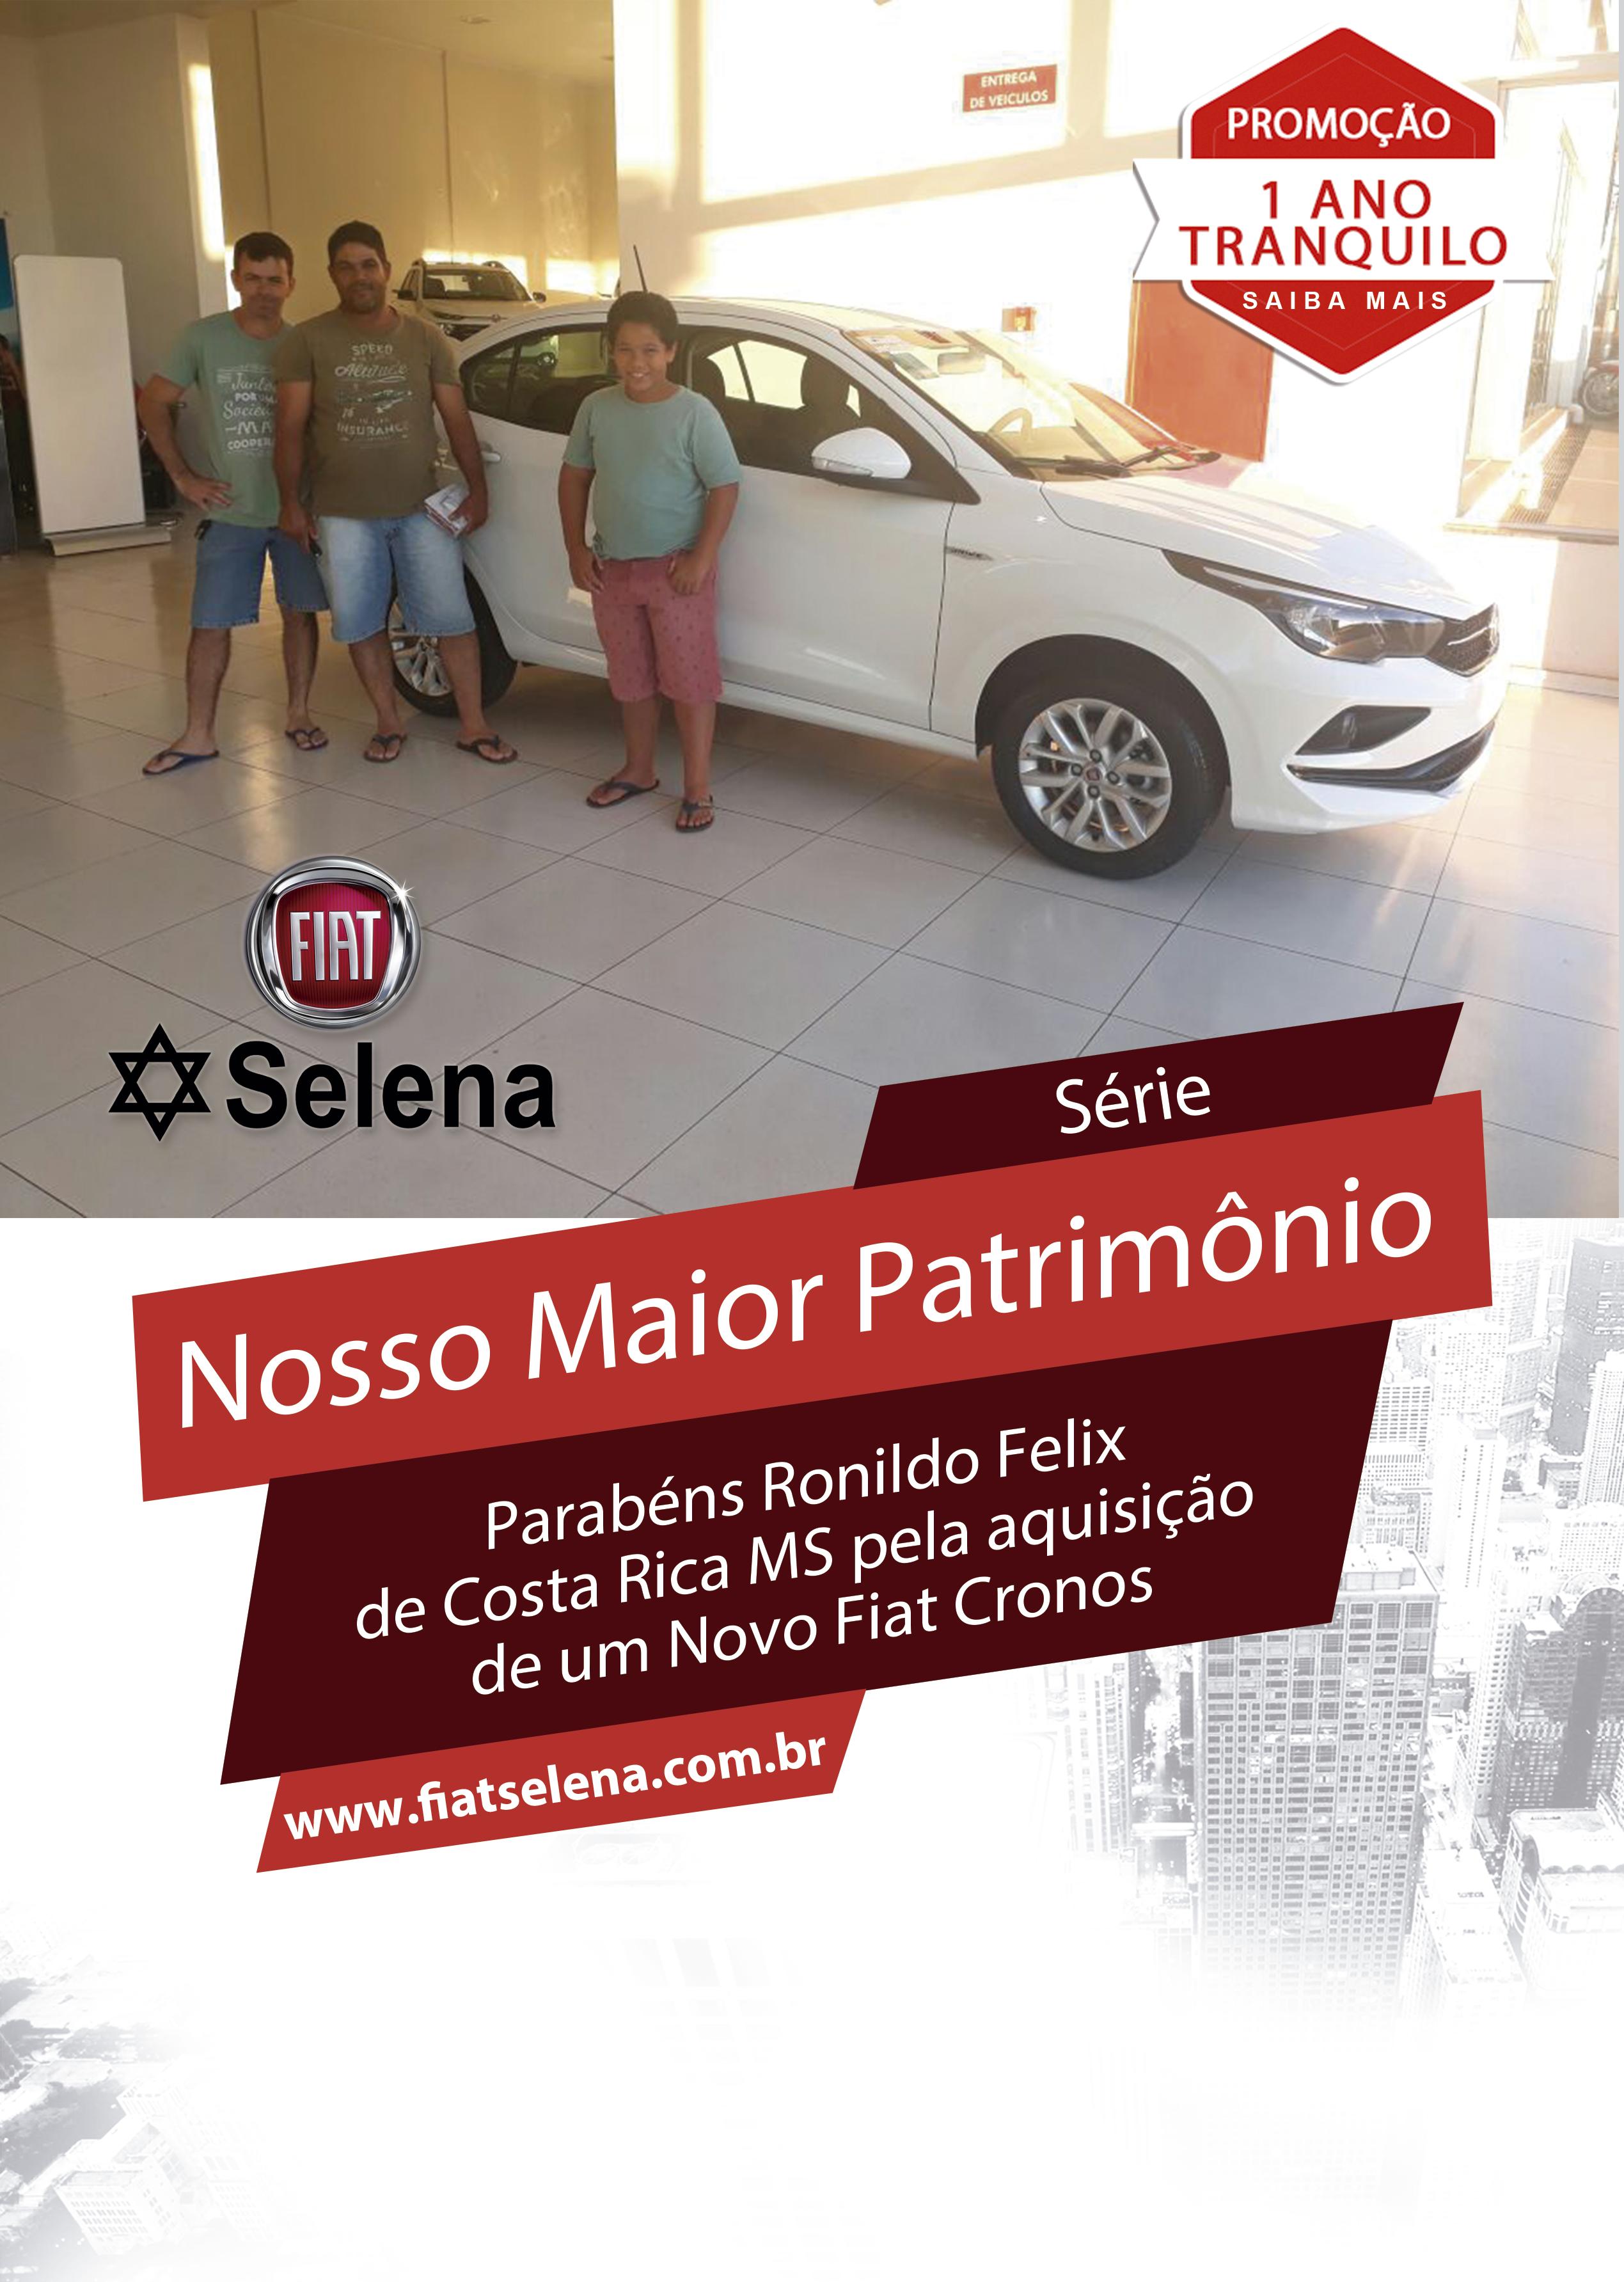 Ronildo Felix , de Costa Rica MS, Fiat Cronos png